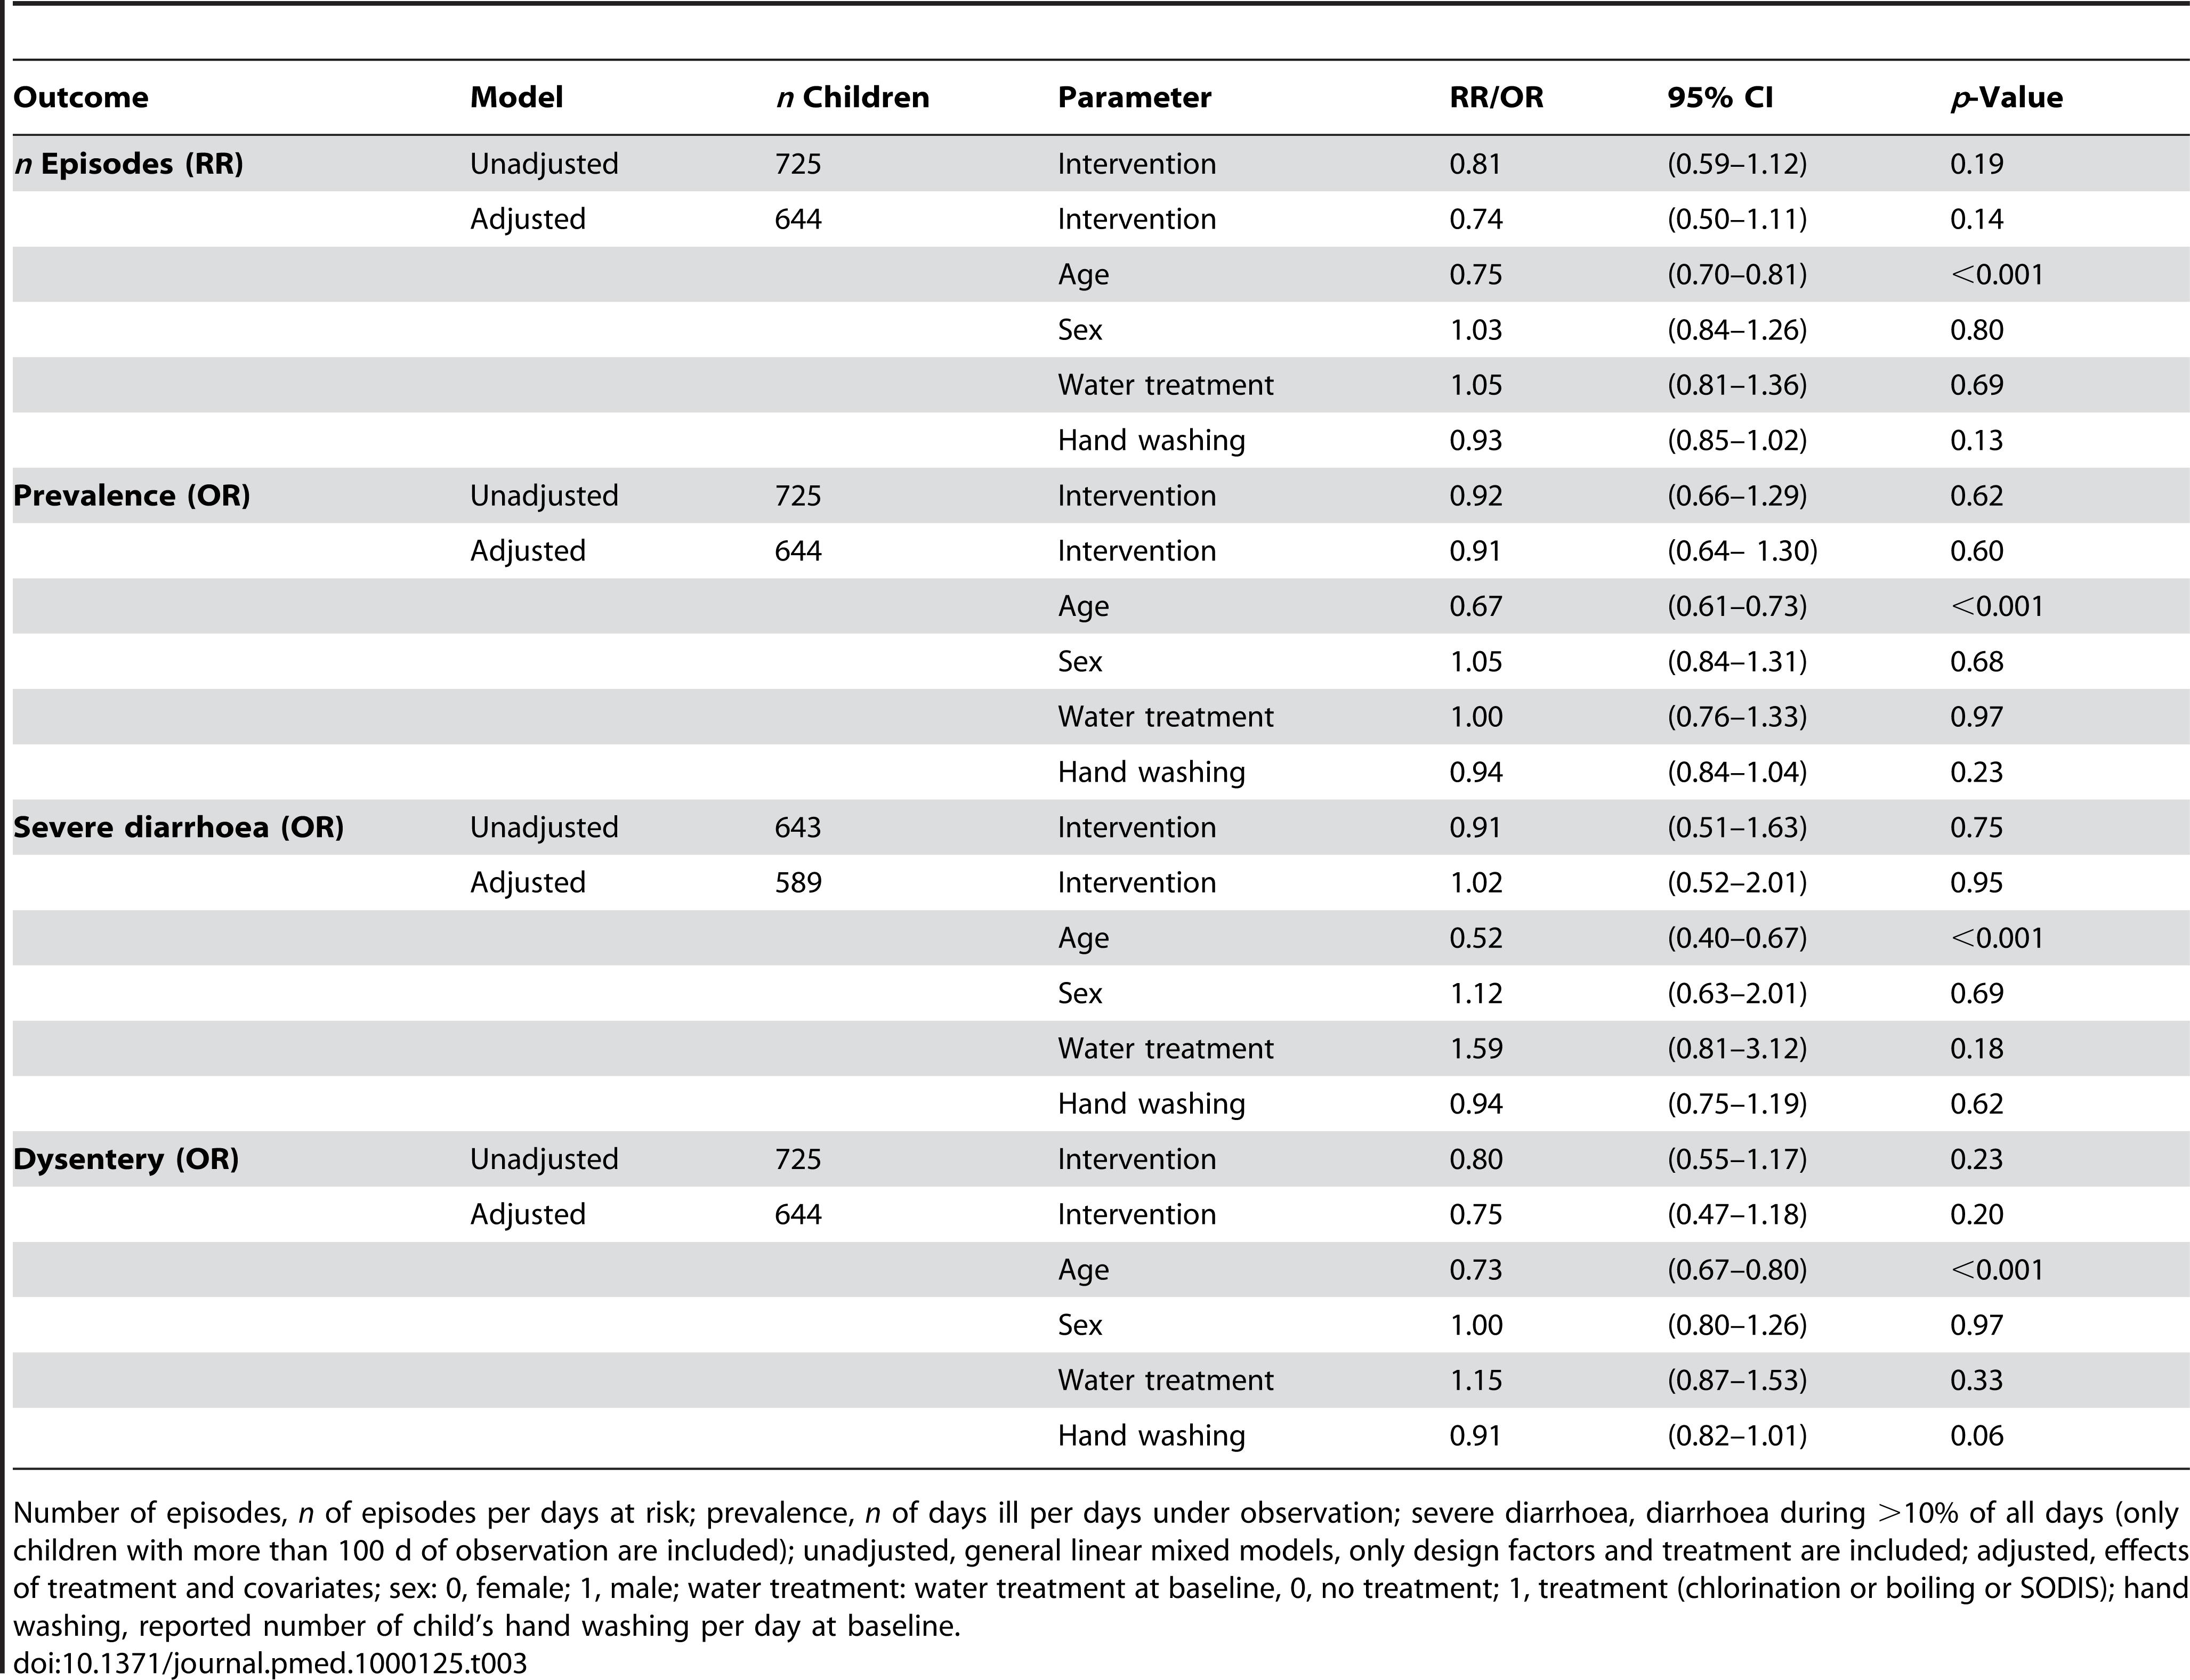 Effect of SODIS on diarrhoea episodes, longitudinal prevalence, severe diarrhoea, and dysentery episodes.